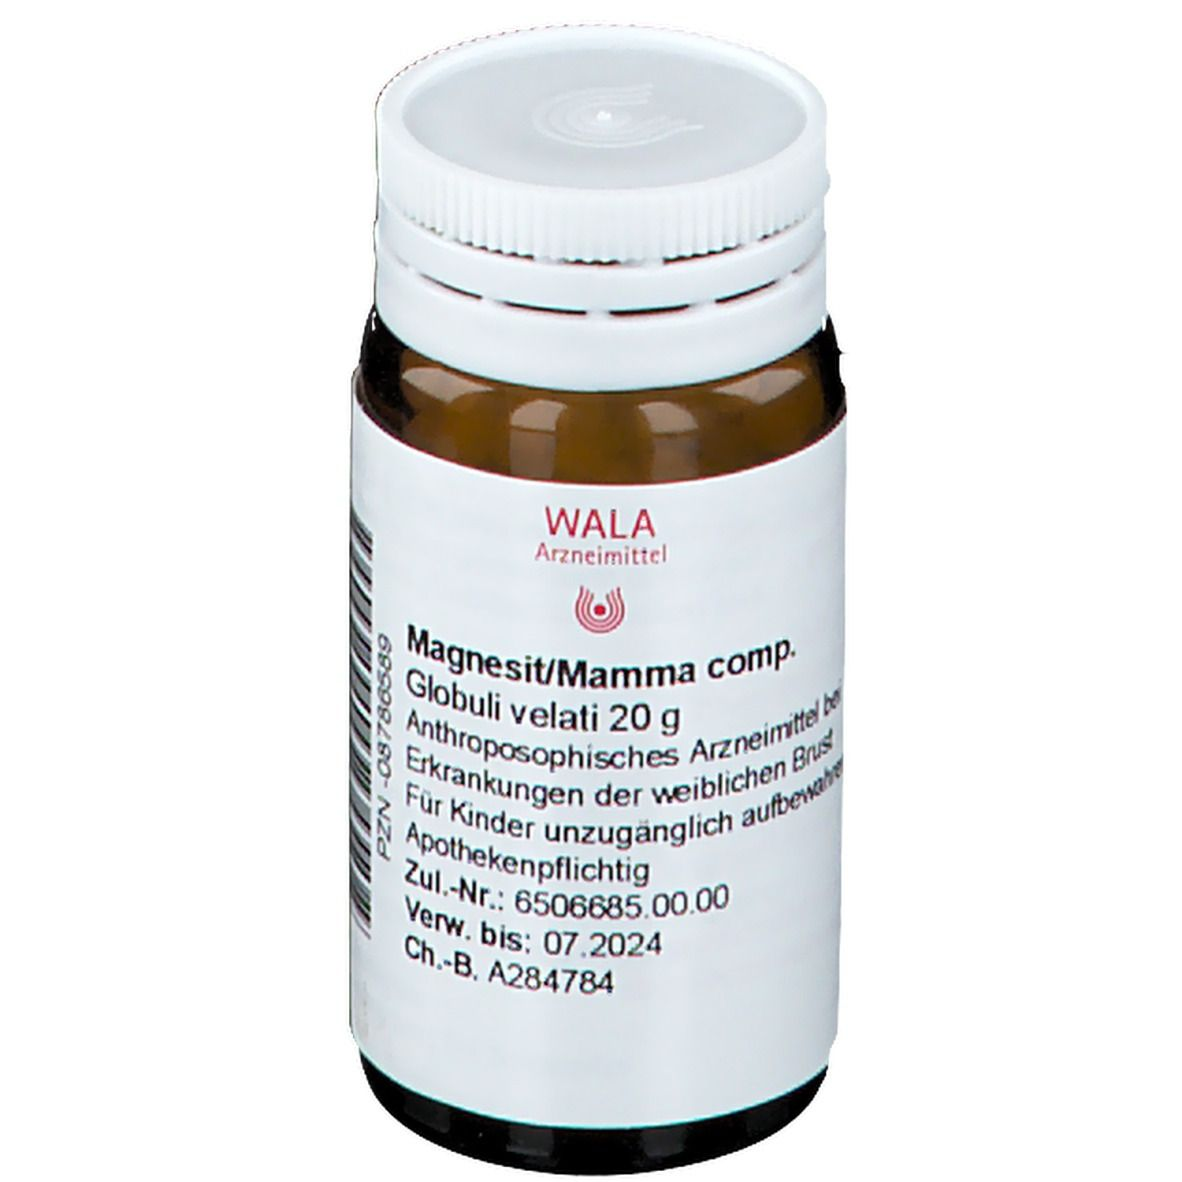 Wala® Magnesit/ Mamma Comp. Globuli